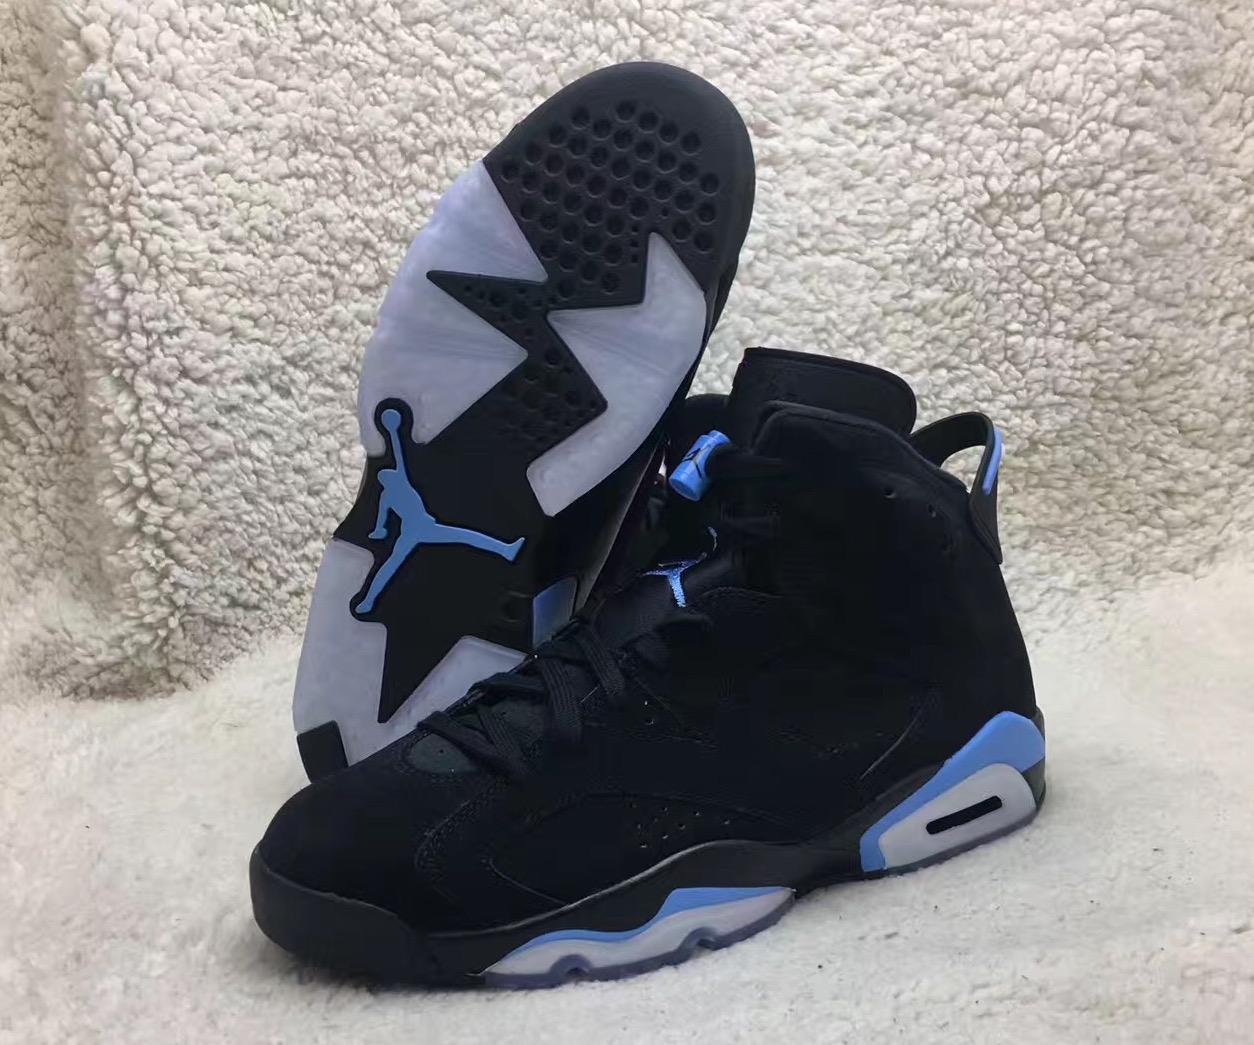 0eab35ff3ad Air Jordan 6 (VI) Retro Color  Black University Blue Style  384664-006.  Release Date  12 23 2017. Price   190.00